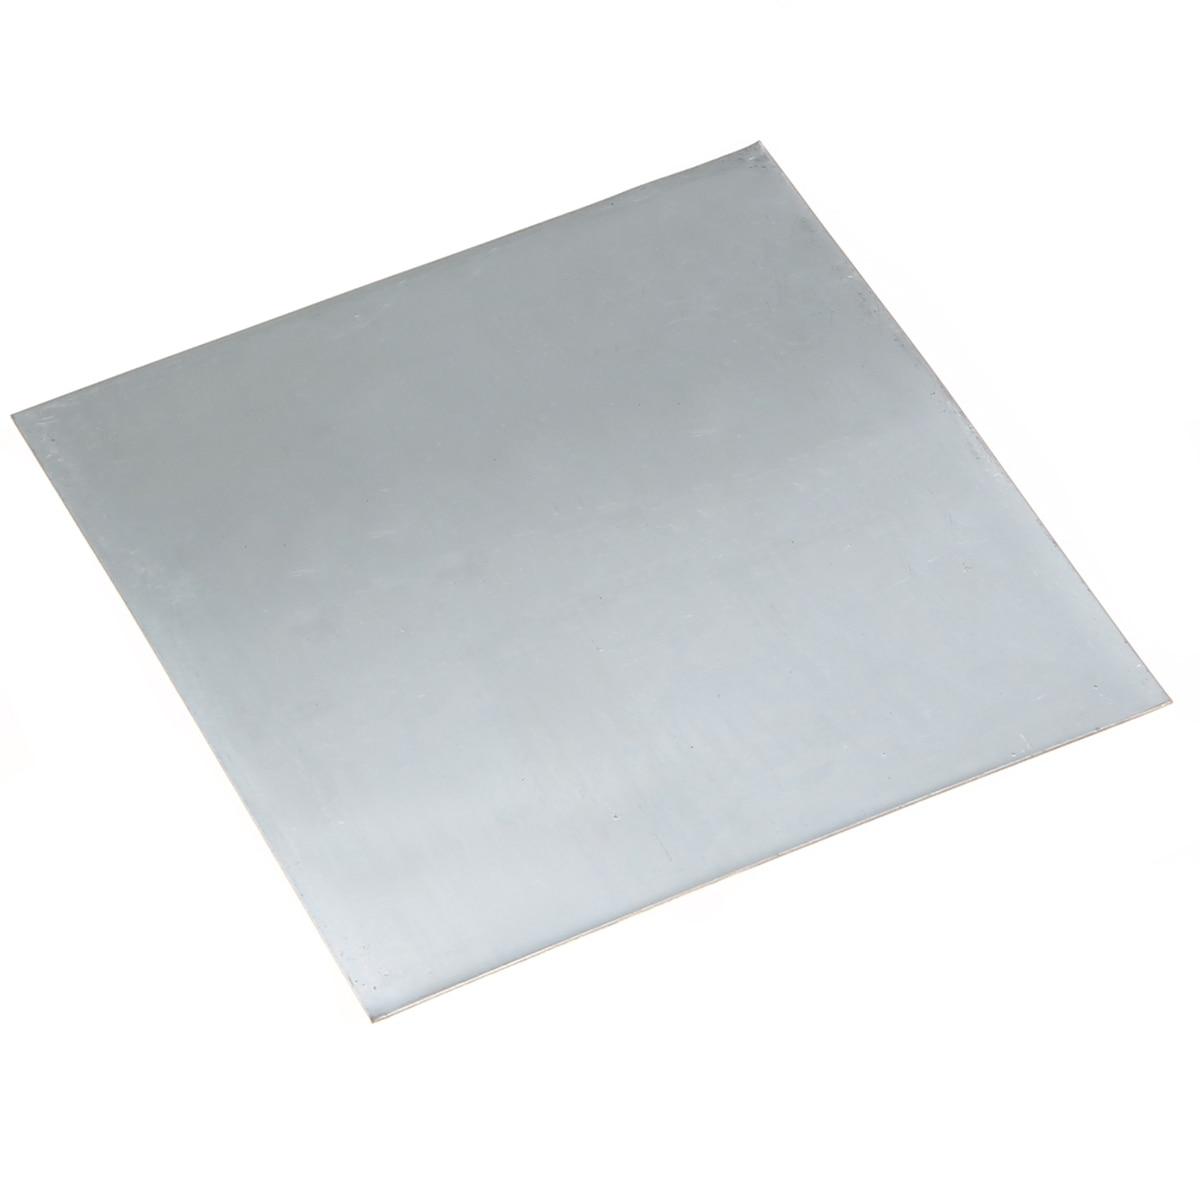 1Pcs  Zinc Plate 99.9% Pure Zinc Zn Sheet Plate 100mmx100mmx0.2mm For Science Lab Accessories